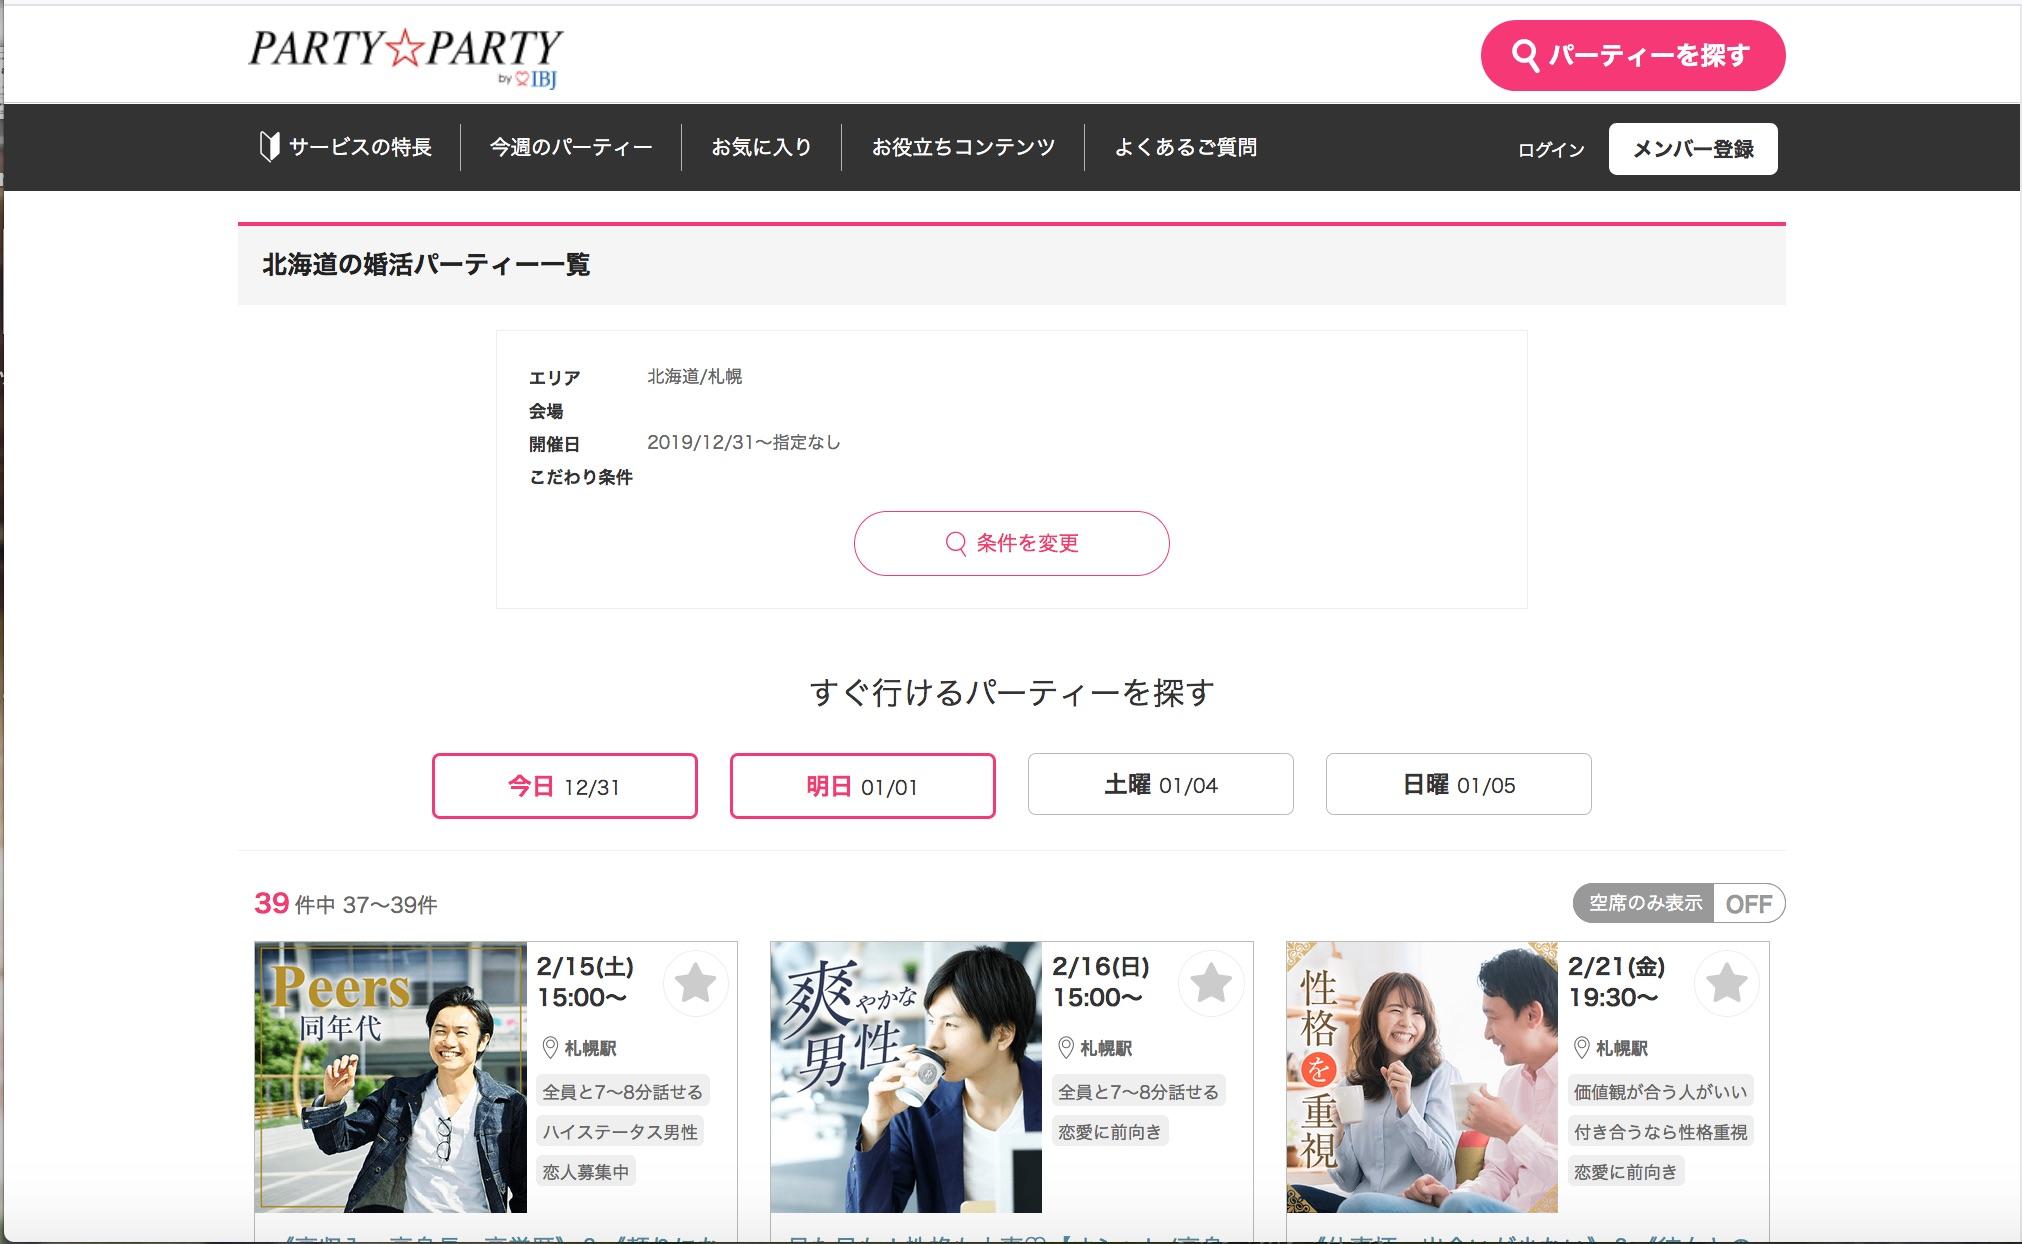 PARTY☆PARTYが開催するパーティーへの「申し込み方法」-3